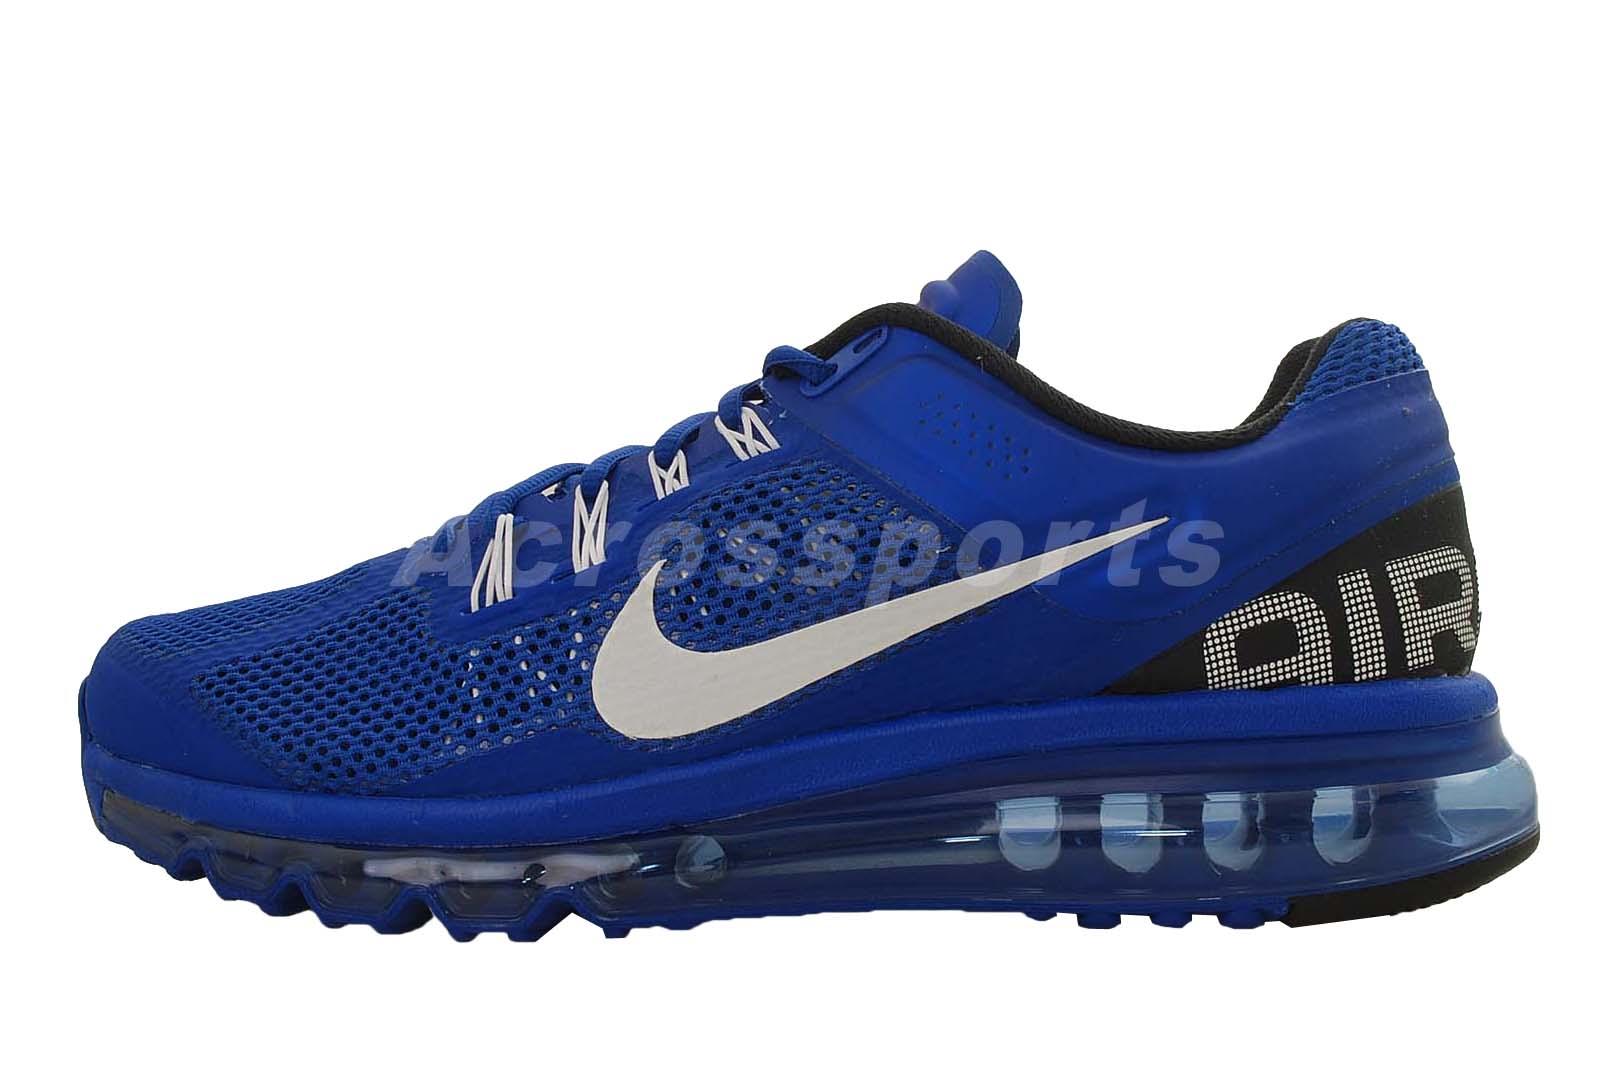 nike air max 2013 hyper blue mens running shoes 360 554886